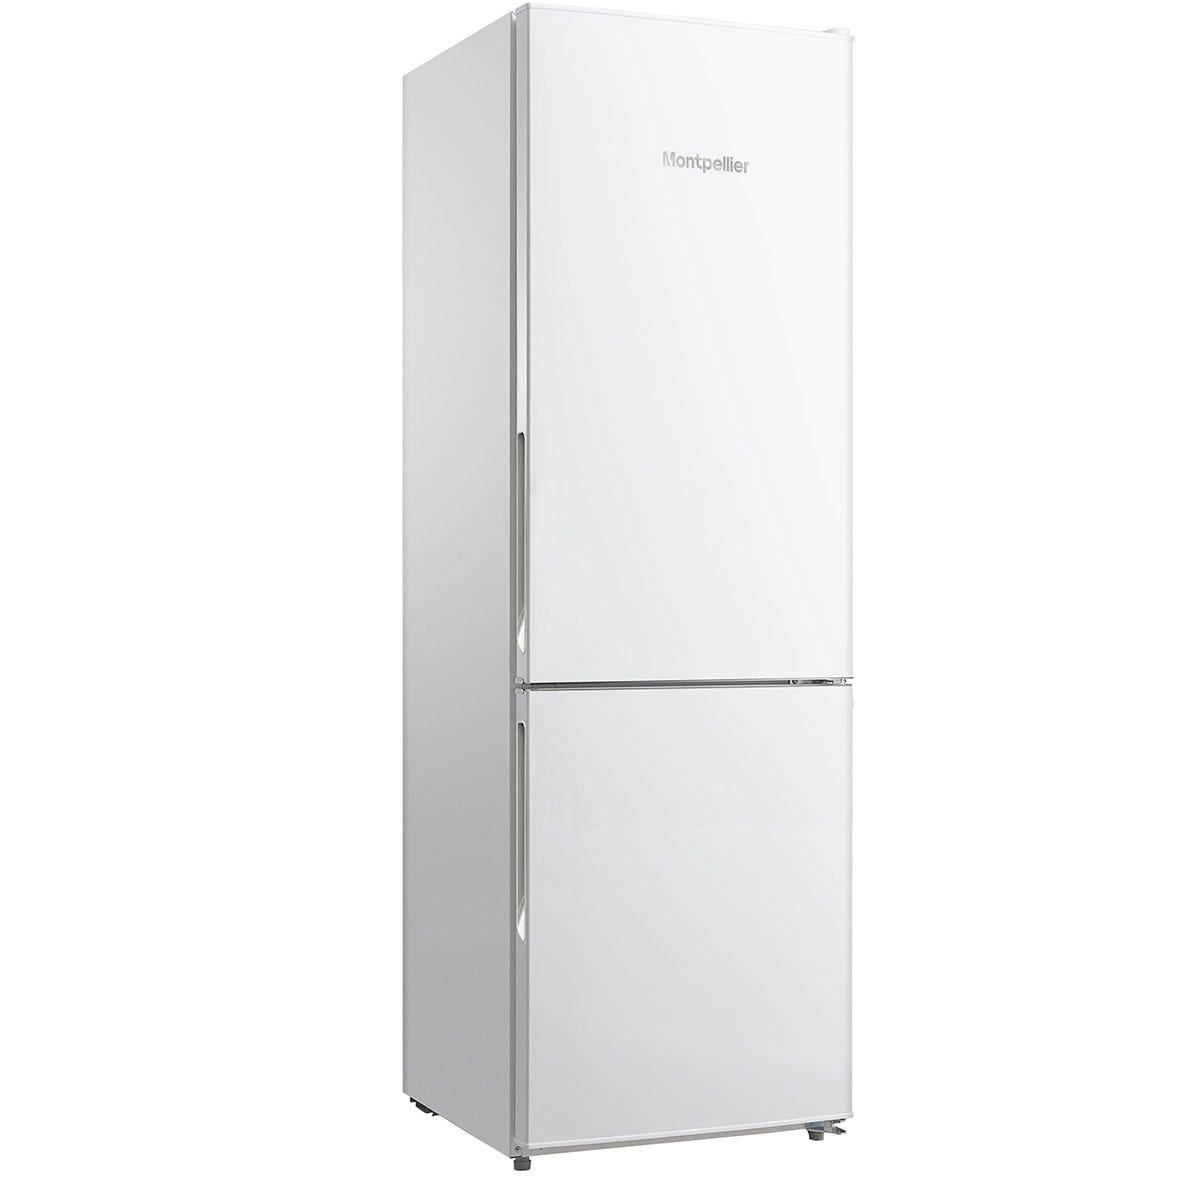 Montpellier MFF18860W 60cm Combi 60/40 Fridge Freezer - White